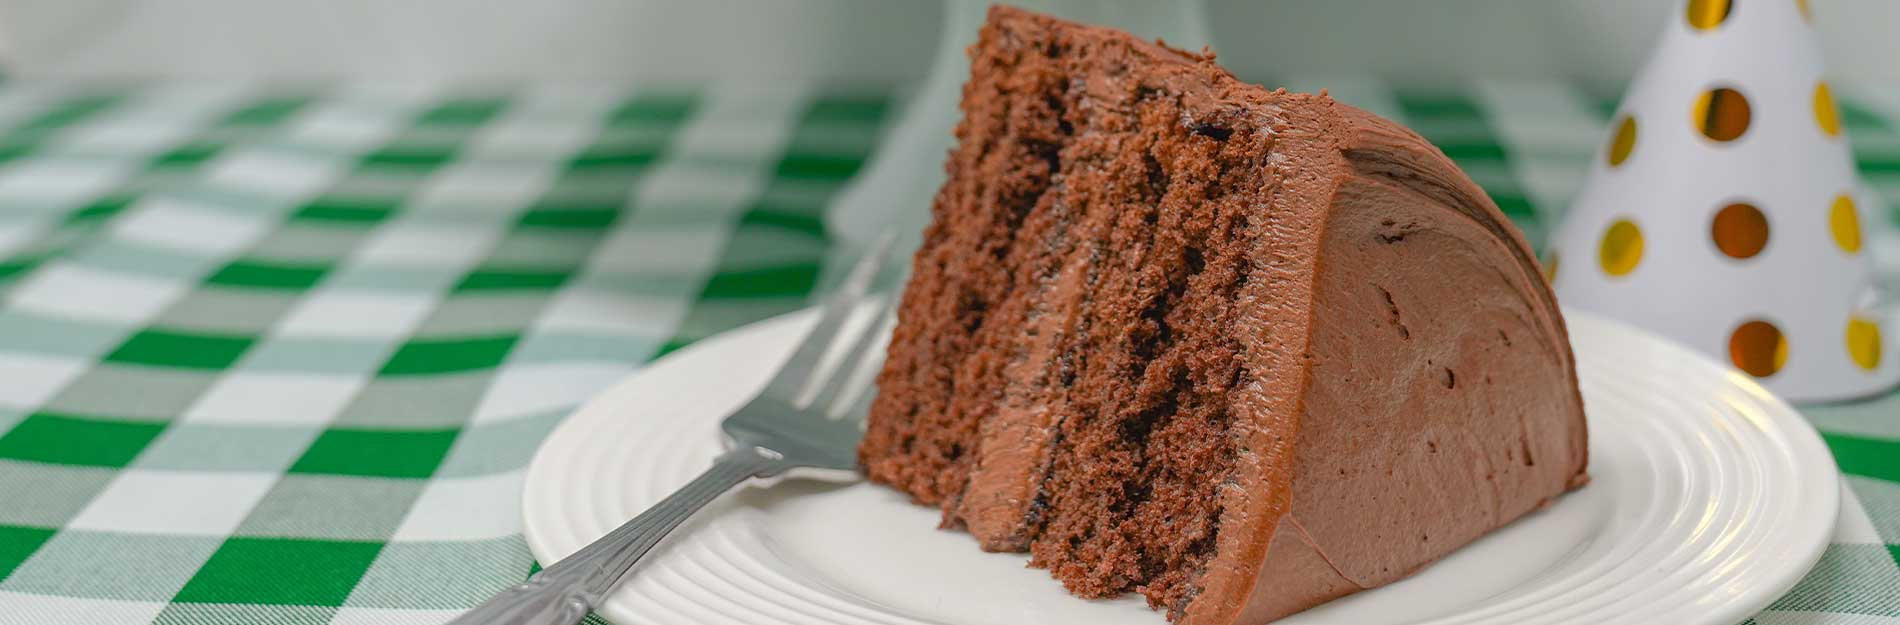 Bill Knapp's Chocolate Celebration Cake